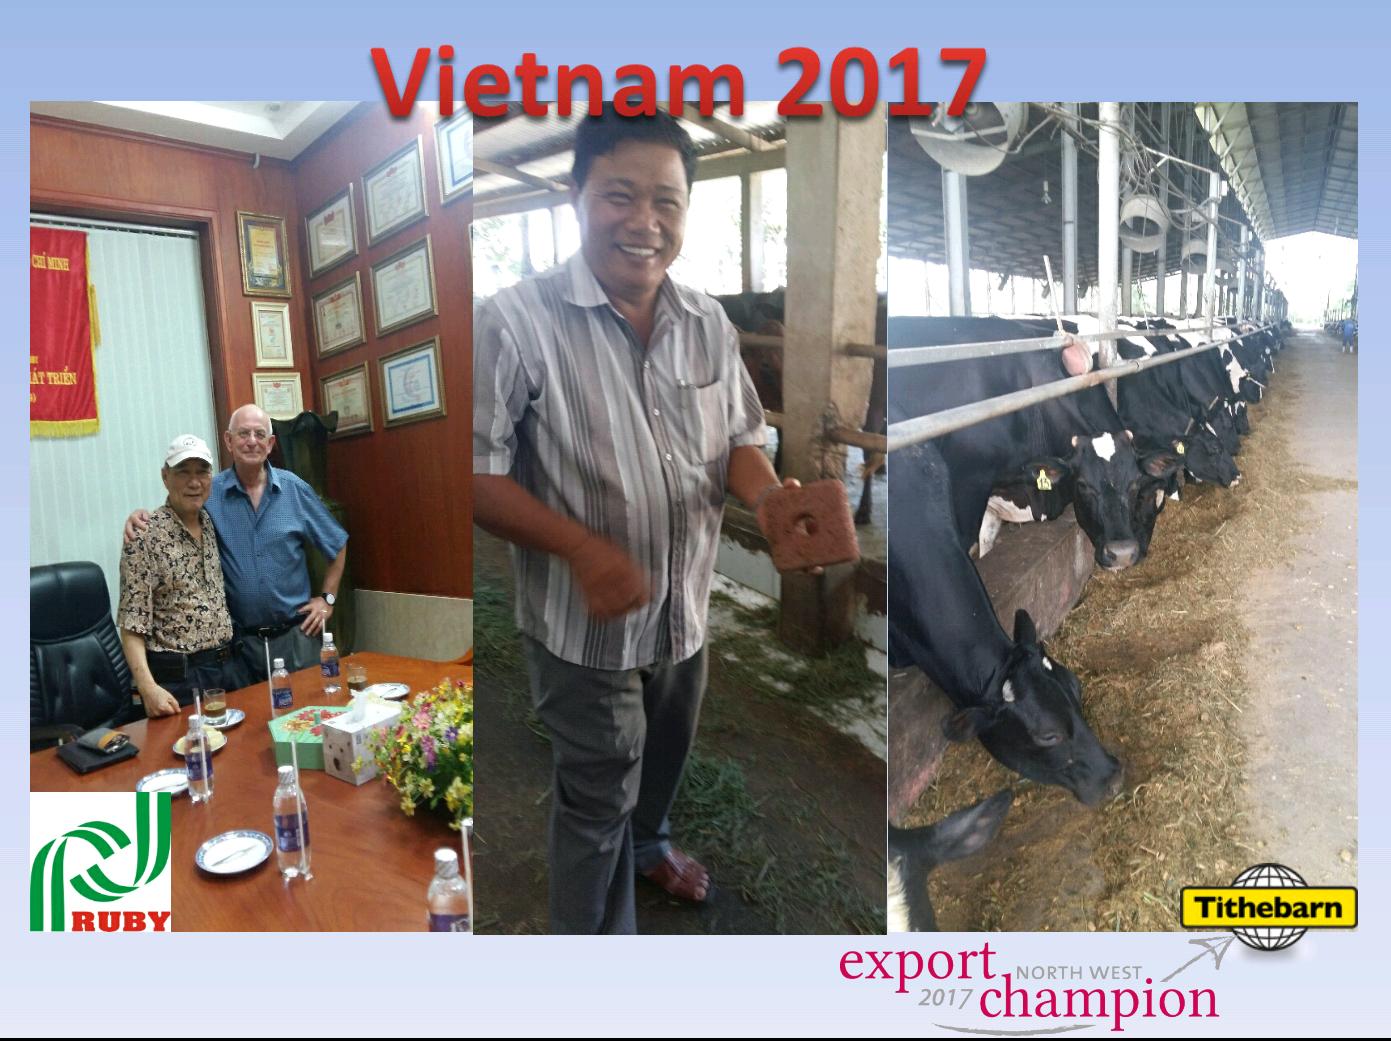 vietnam 2017 twitter